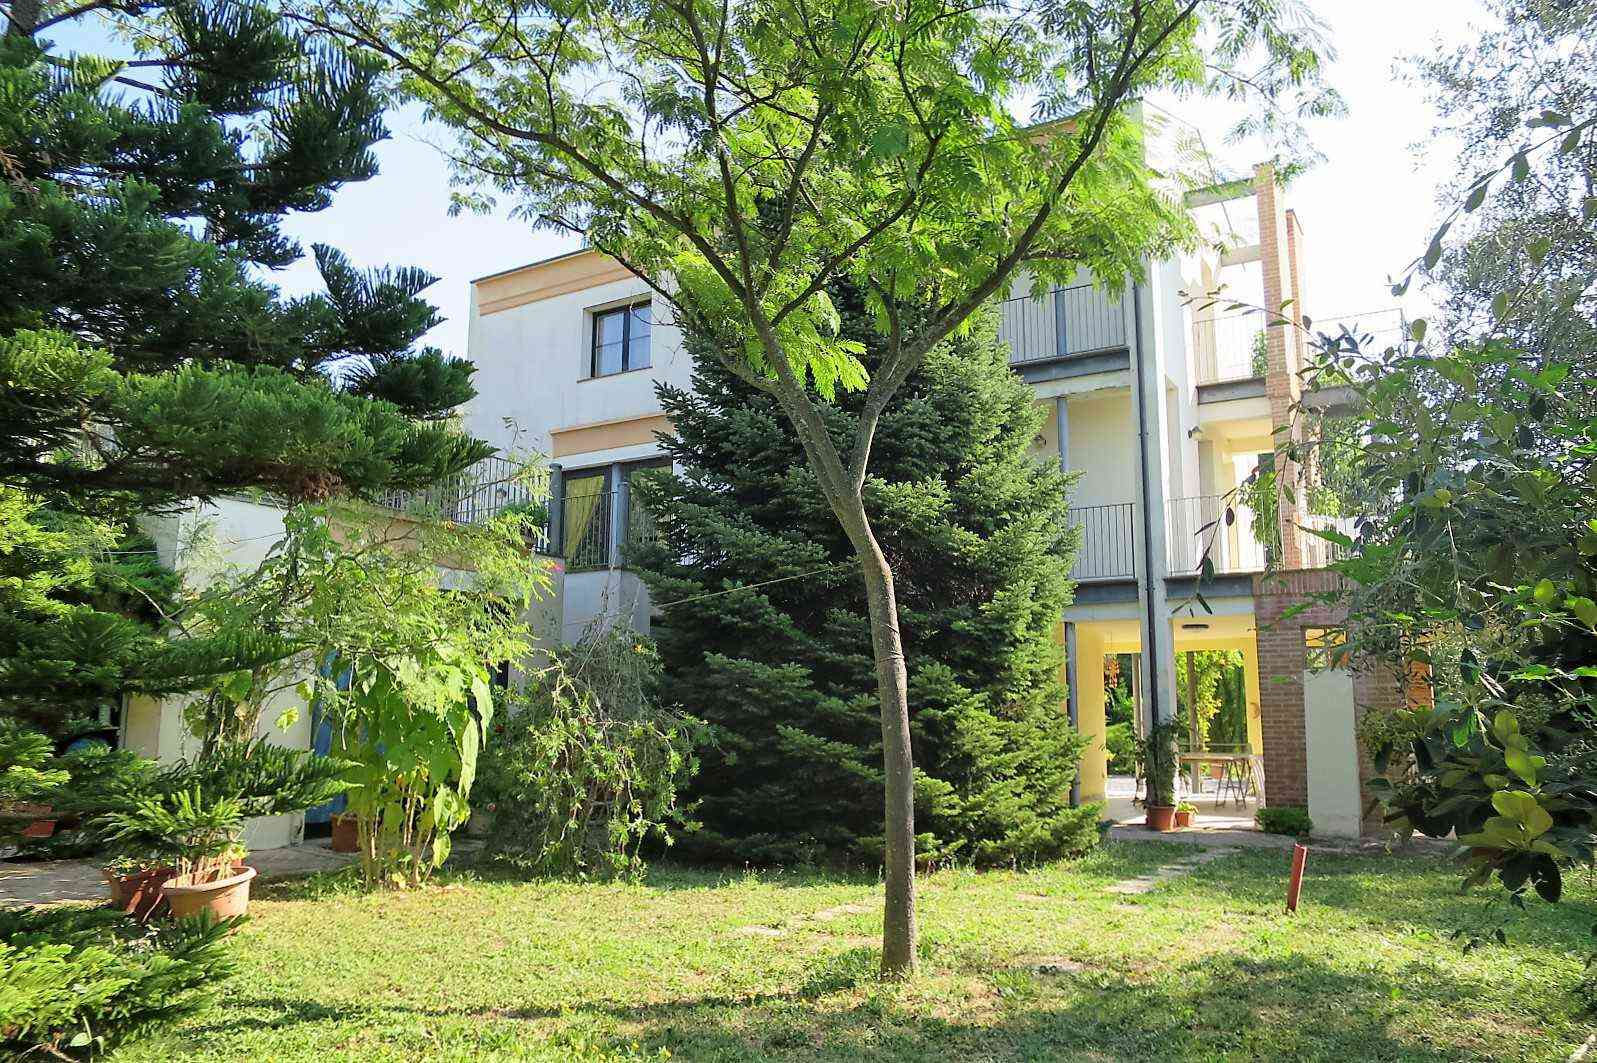 Villa Villa in vendita Atri (TE), Villa Paola - Atri - EUR 473.281 90